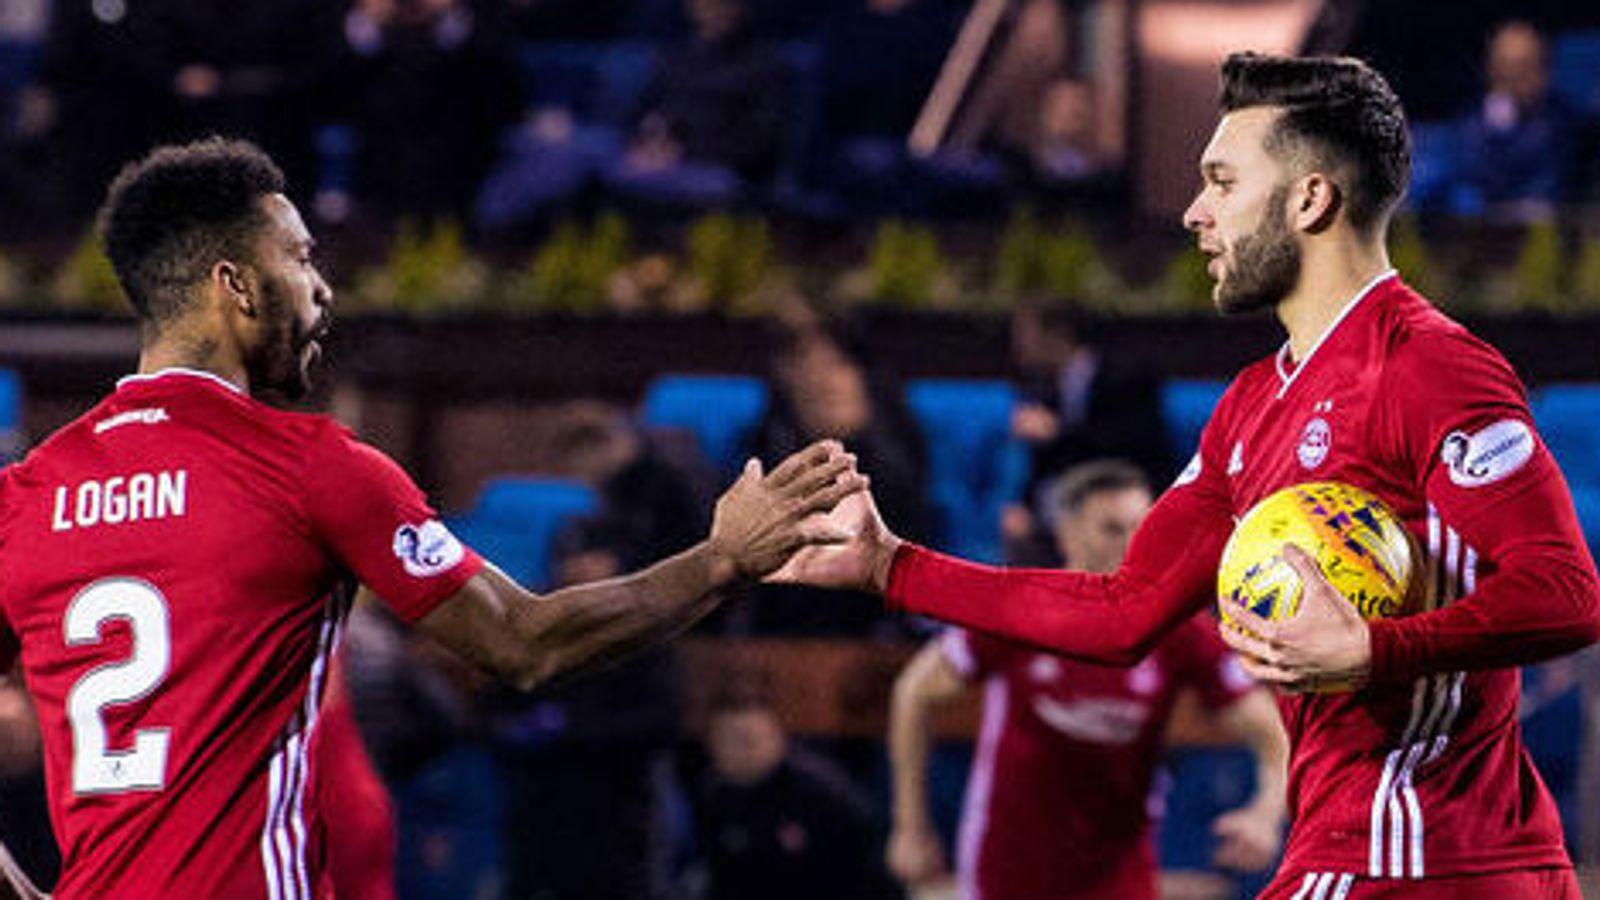 Scottish Premiership round-up: Aberdeen fight back to draw with Kilmarnock   Football News